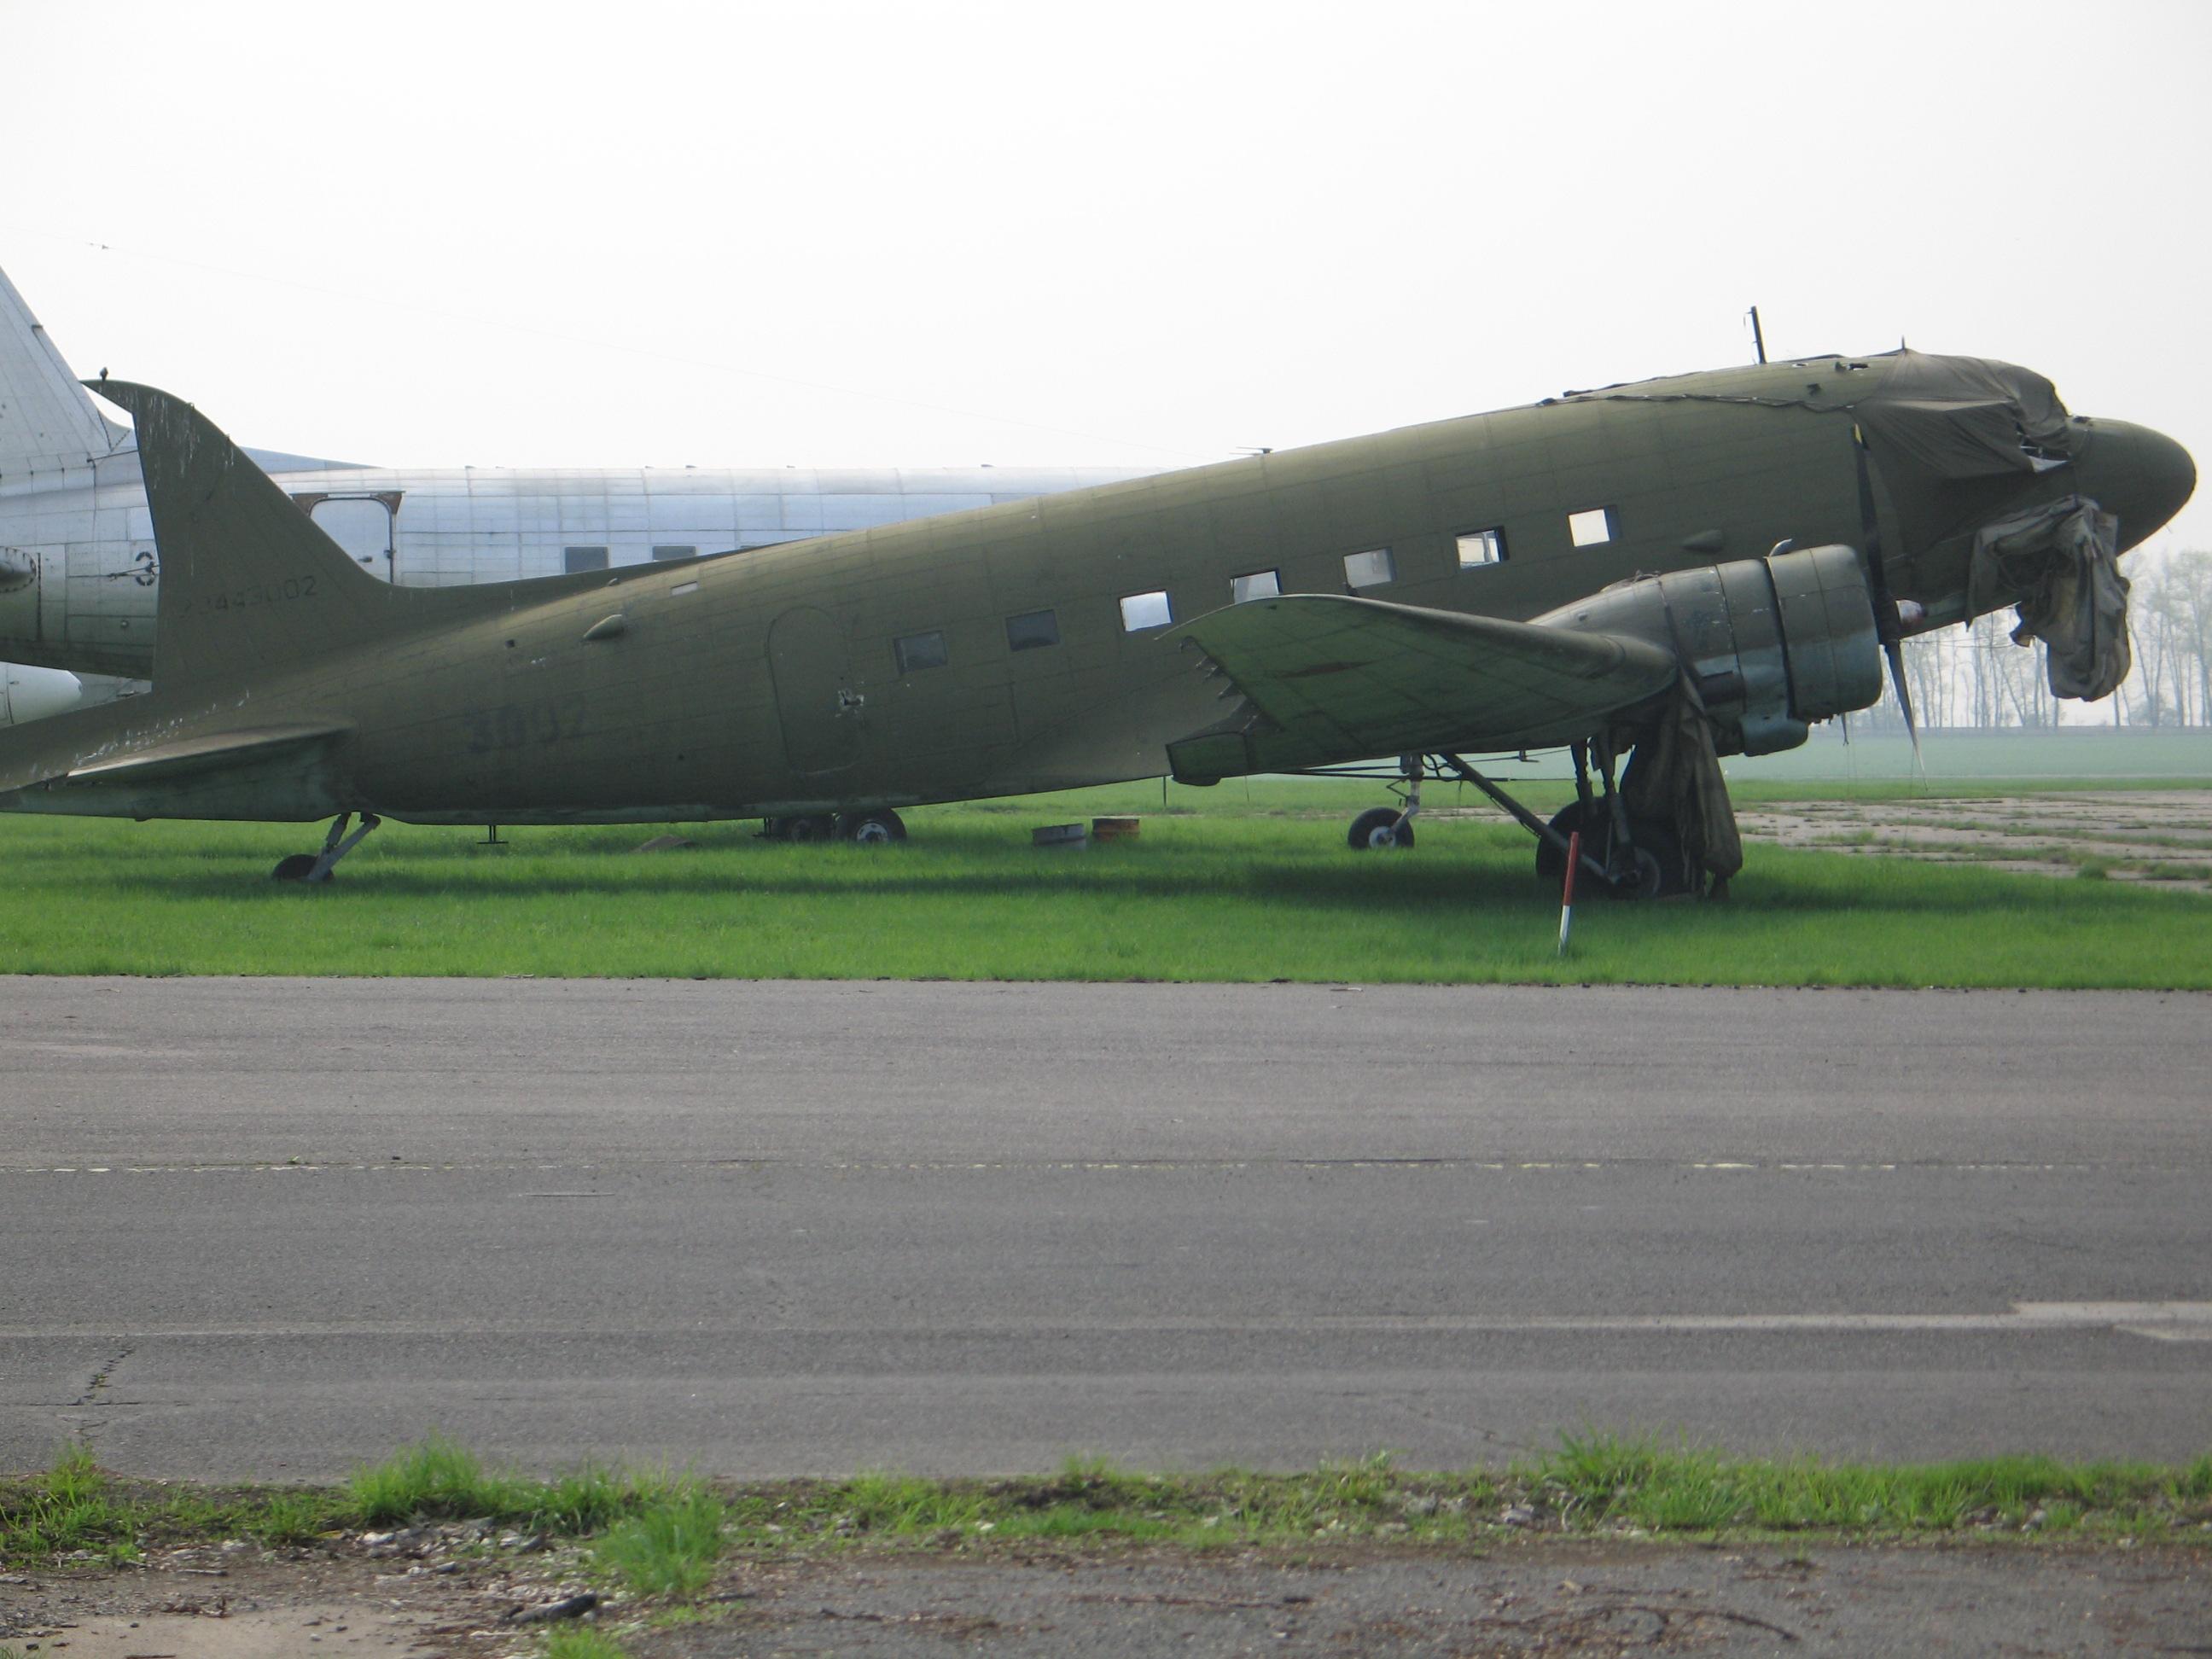 Image of Lisunov Li-2